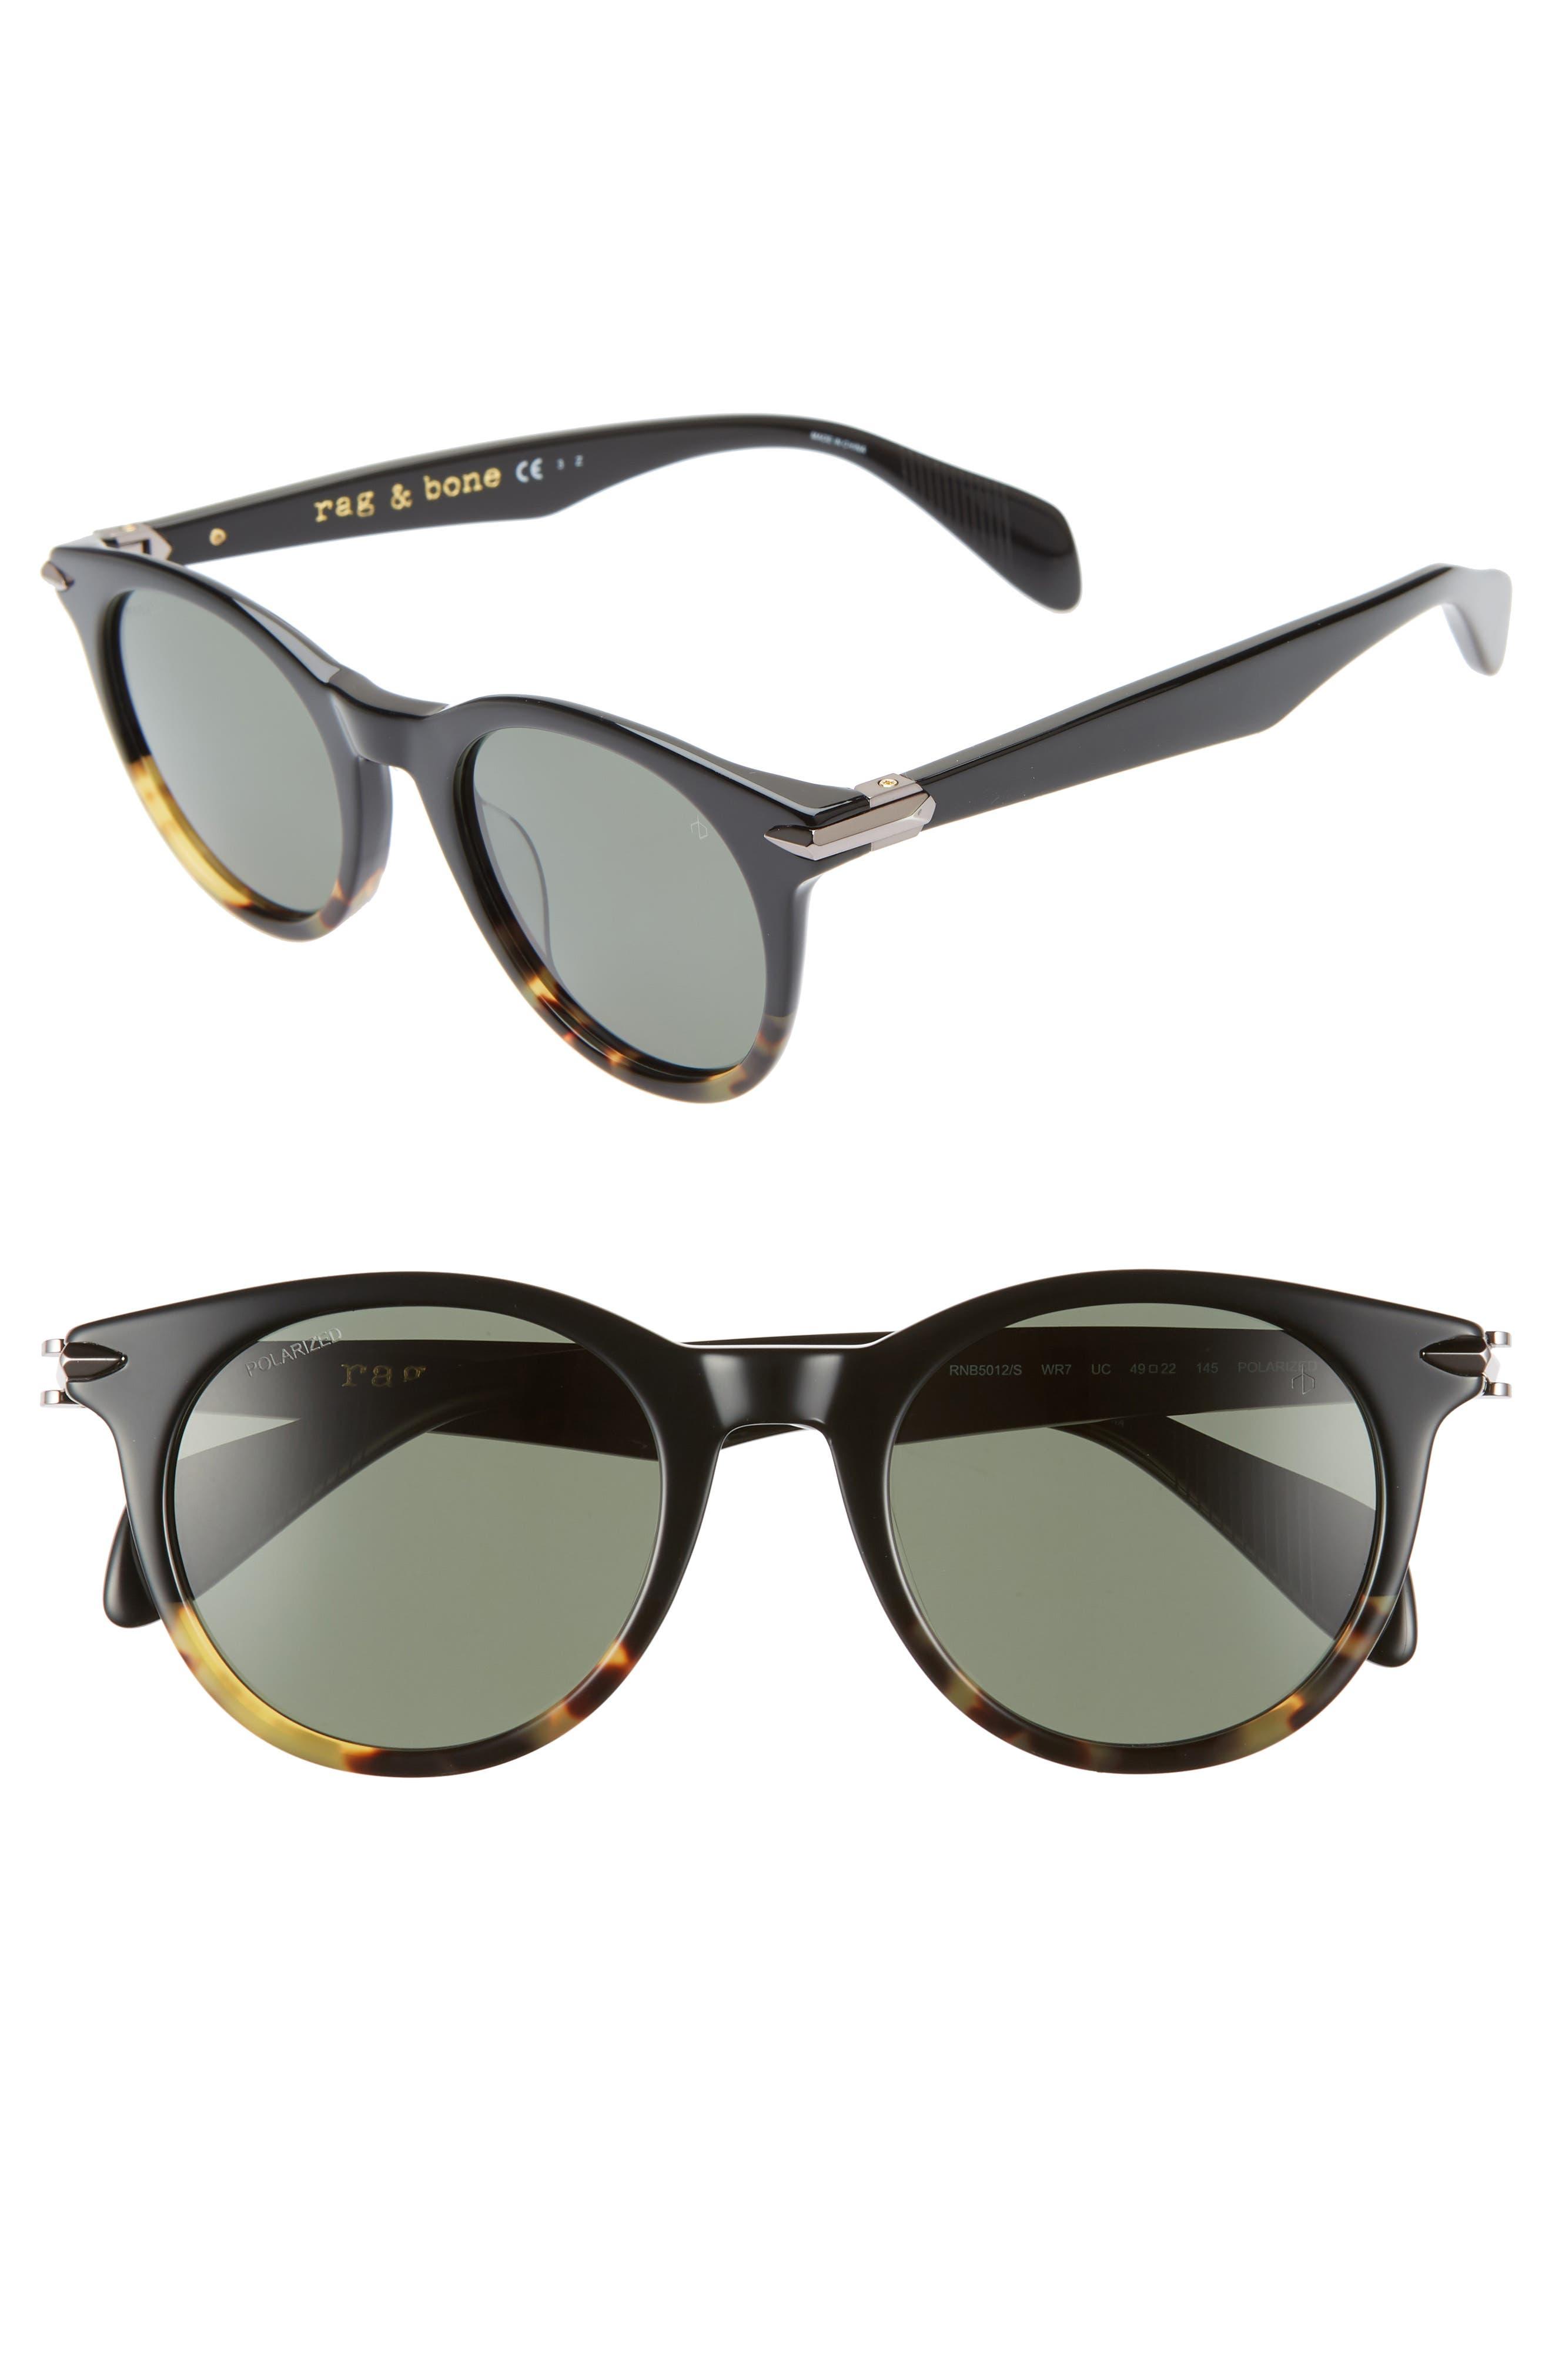 4b7c23f26d2 Rag   Bone 4m Polarized Round Sunglasses - Black  Havana